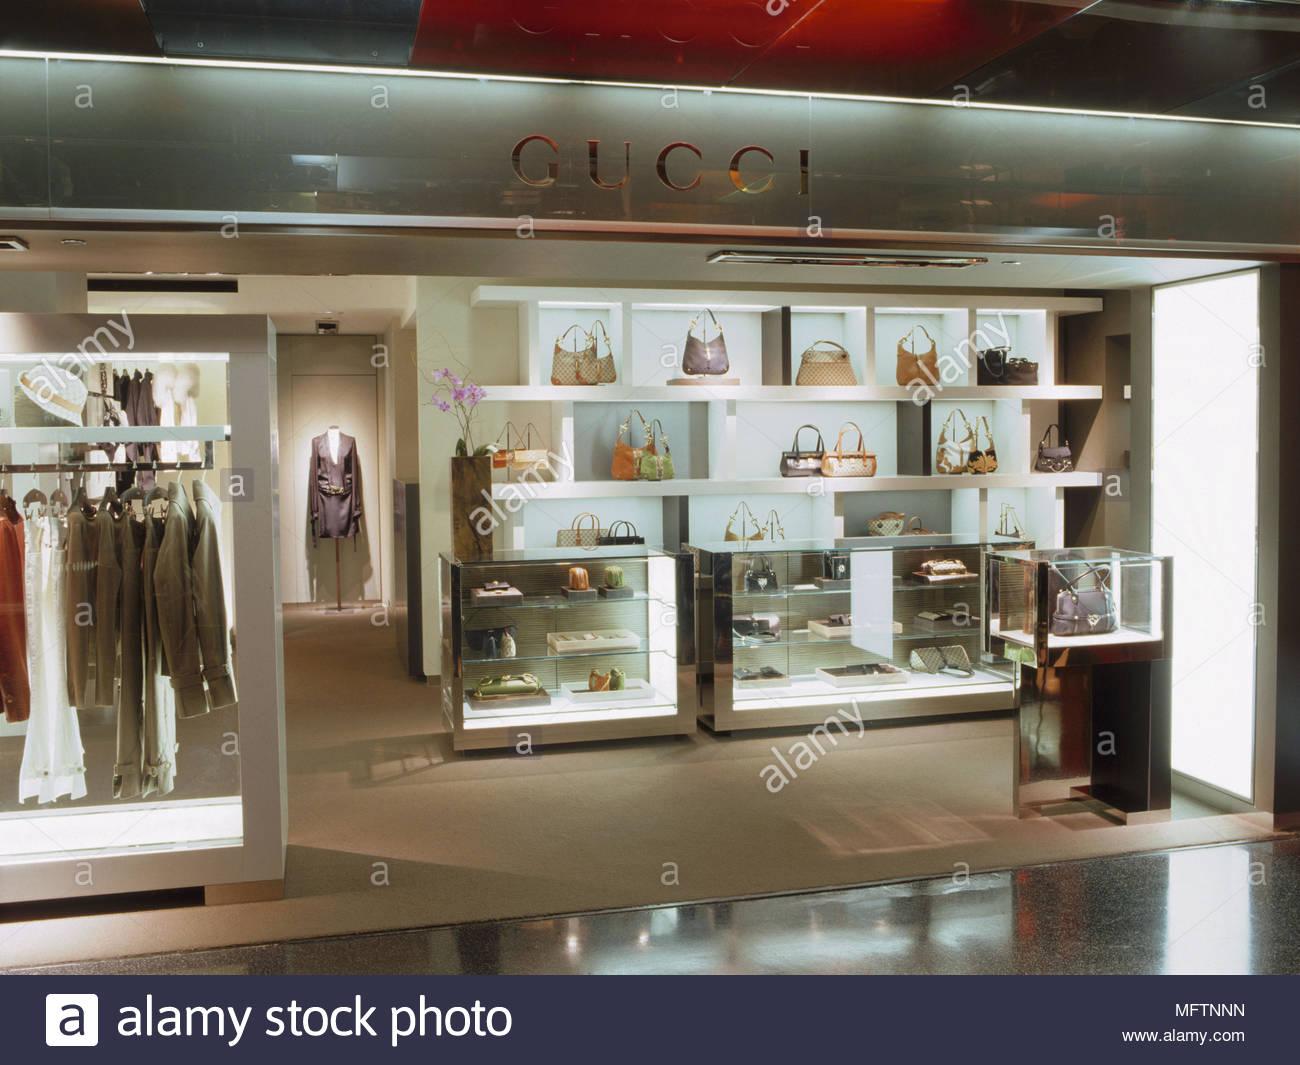 7903d731392 Interior of Gucci shop Interiors designer shops shopping retailing display  clothing